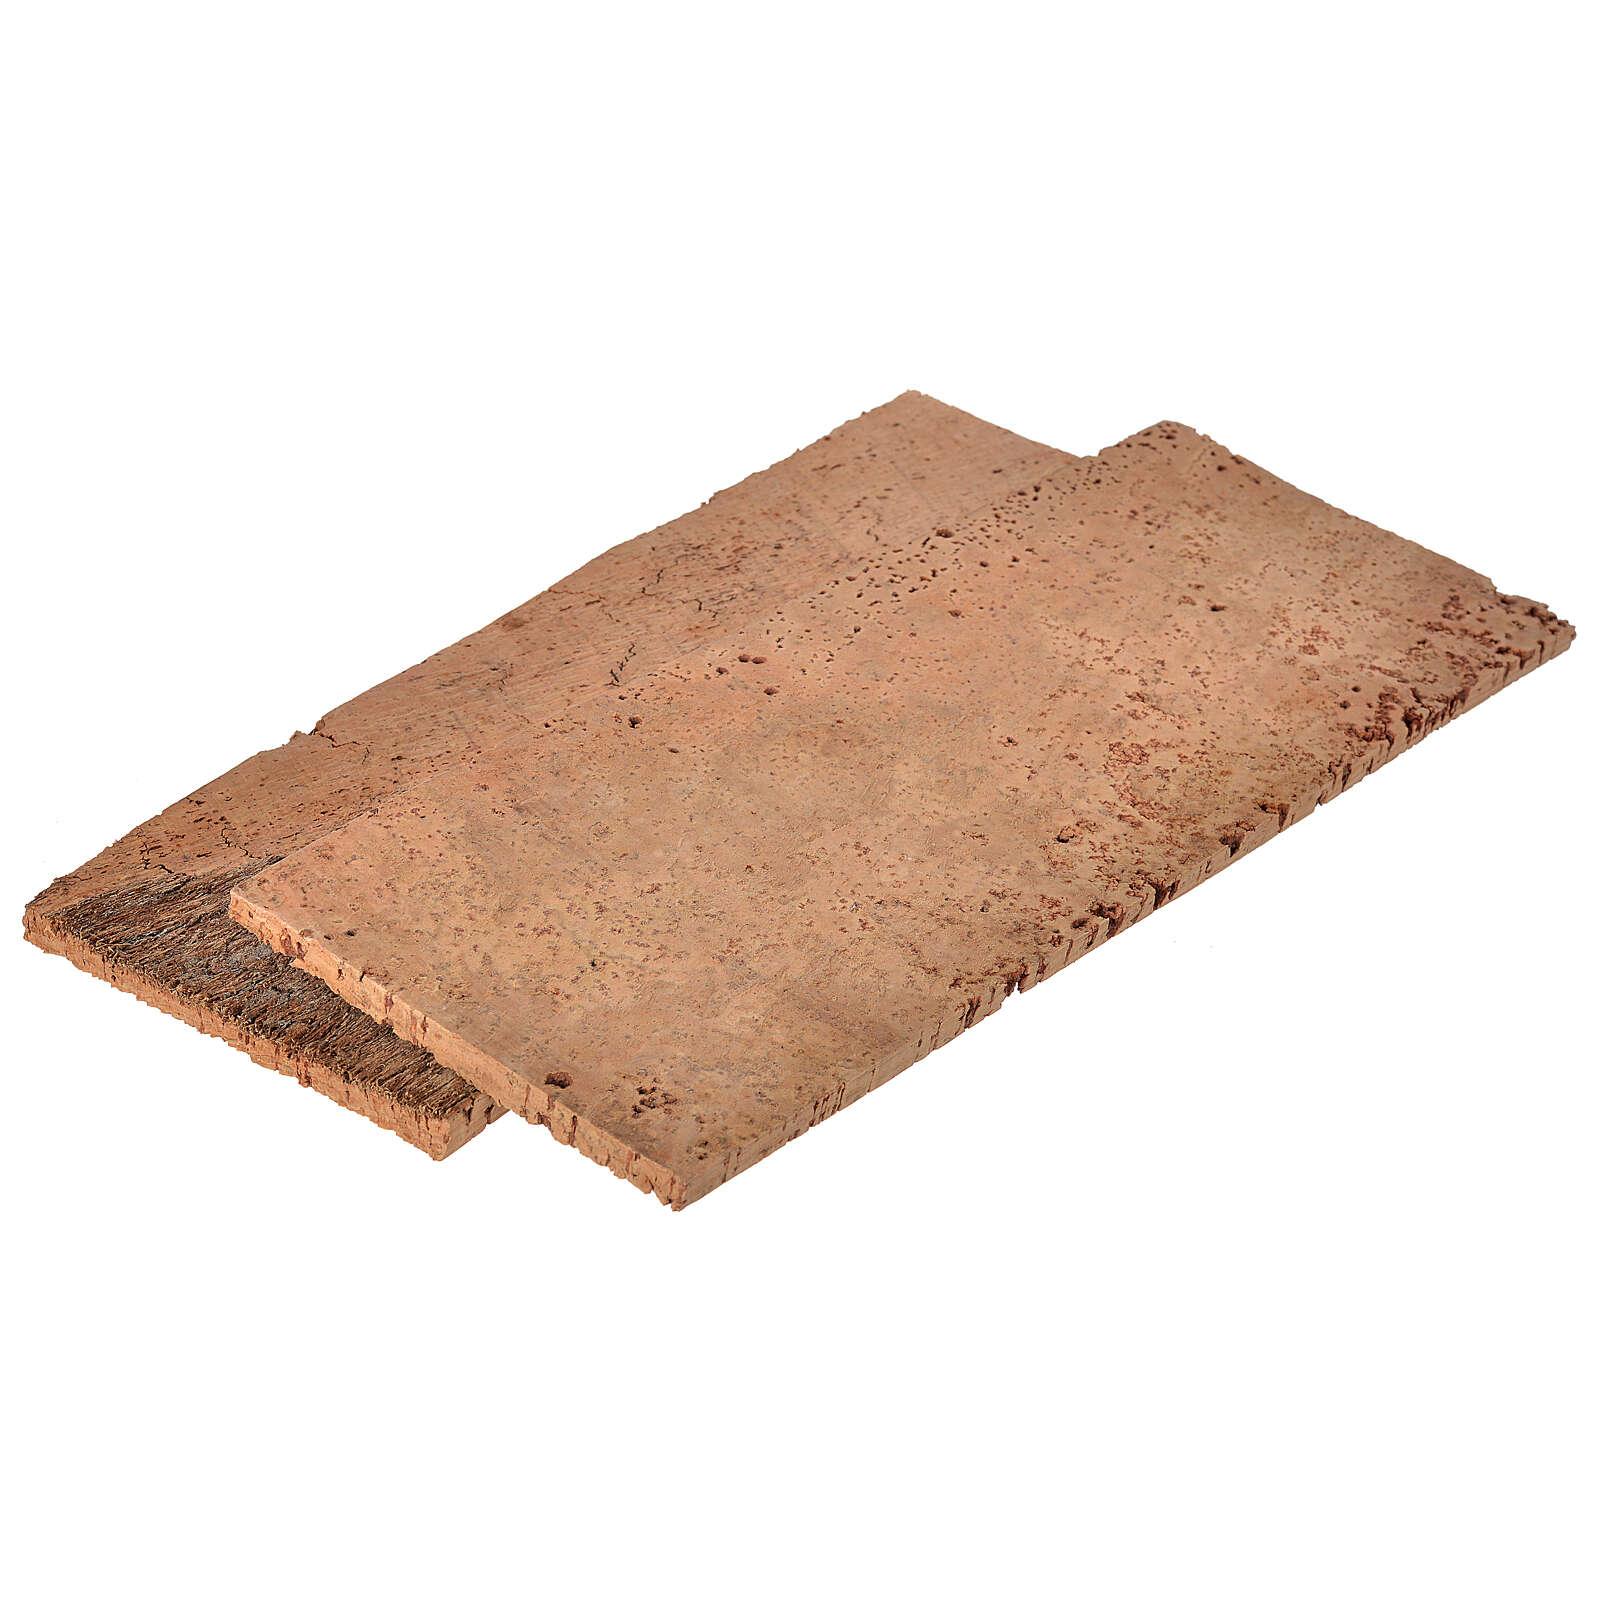 Tavoletta sughero naturale 2 pz cm 27x9x0,5 4